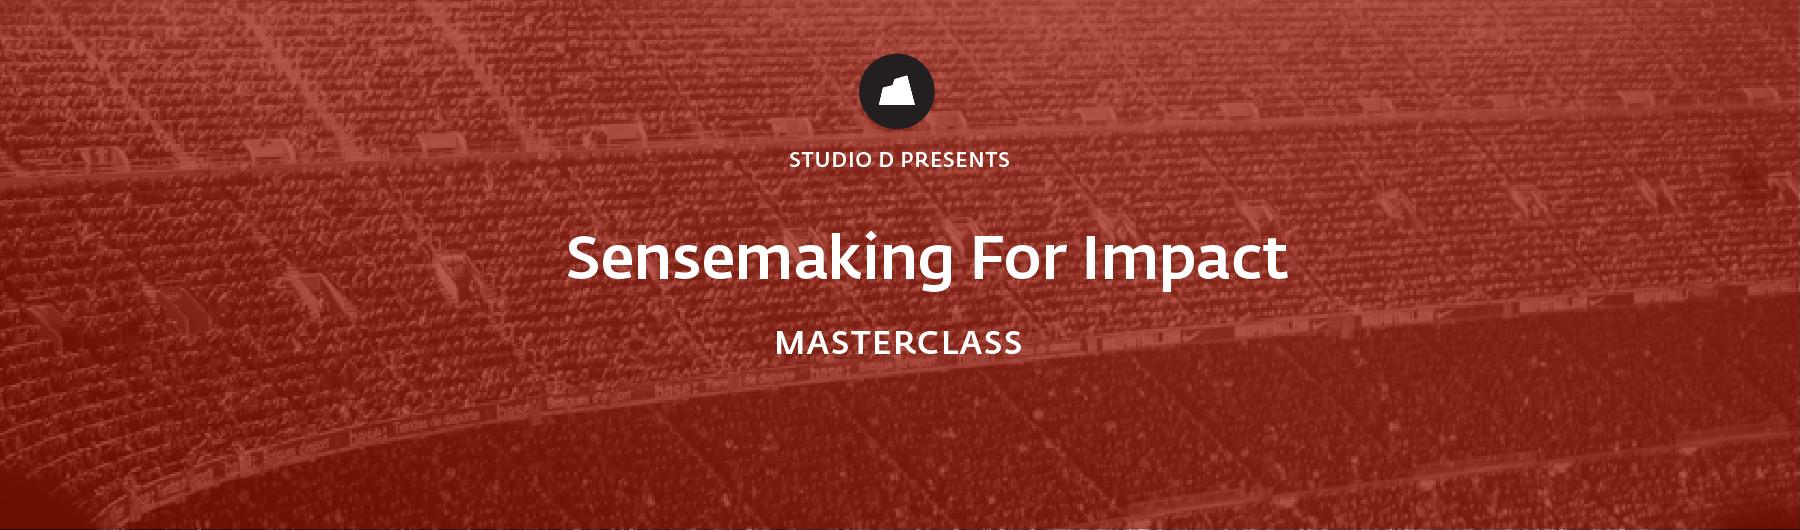 Sensemaking For Impact Masterclass, 14 April 2020, Mumbai